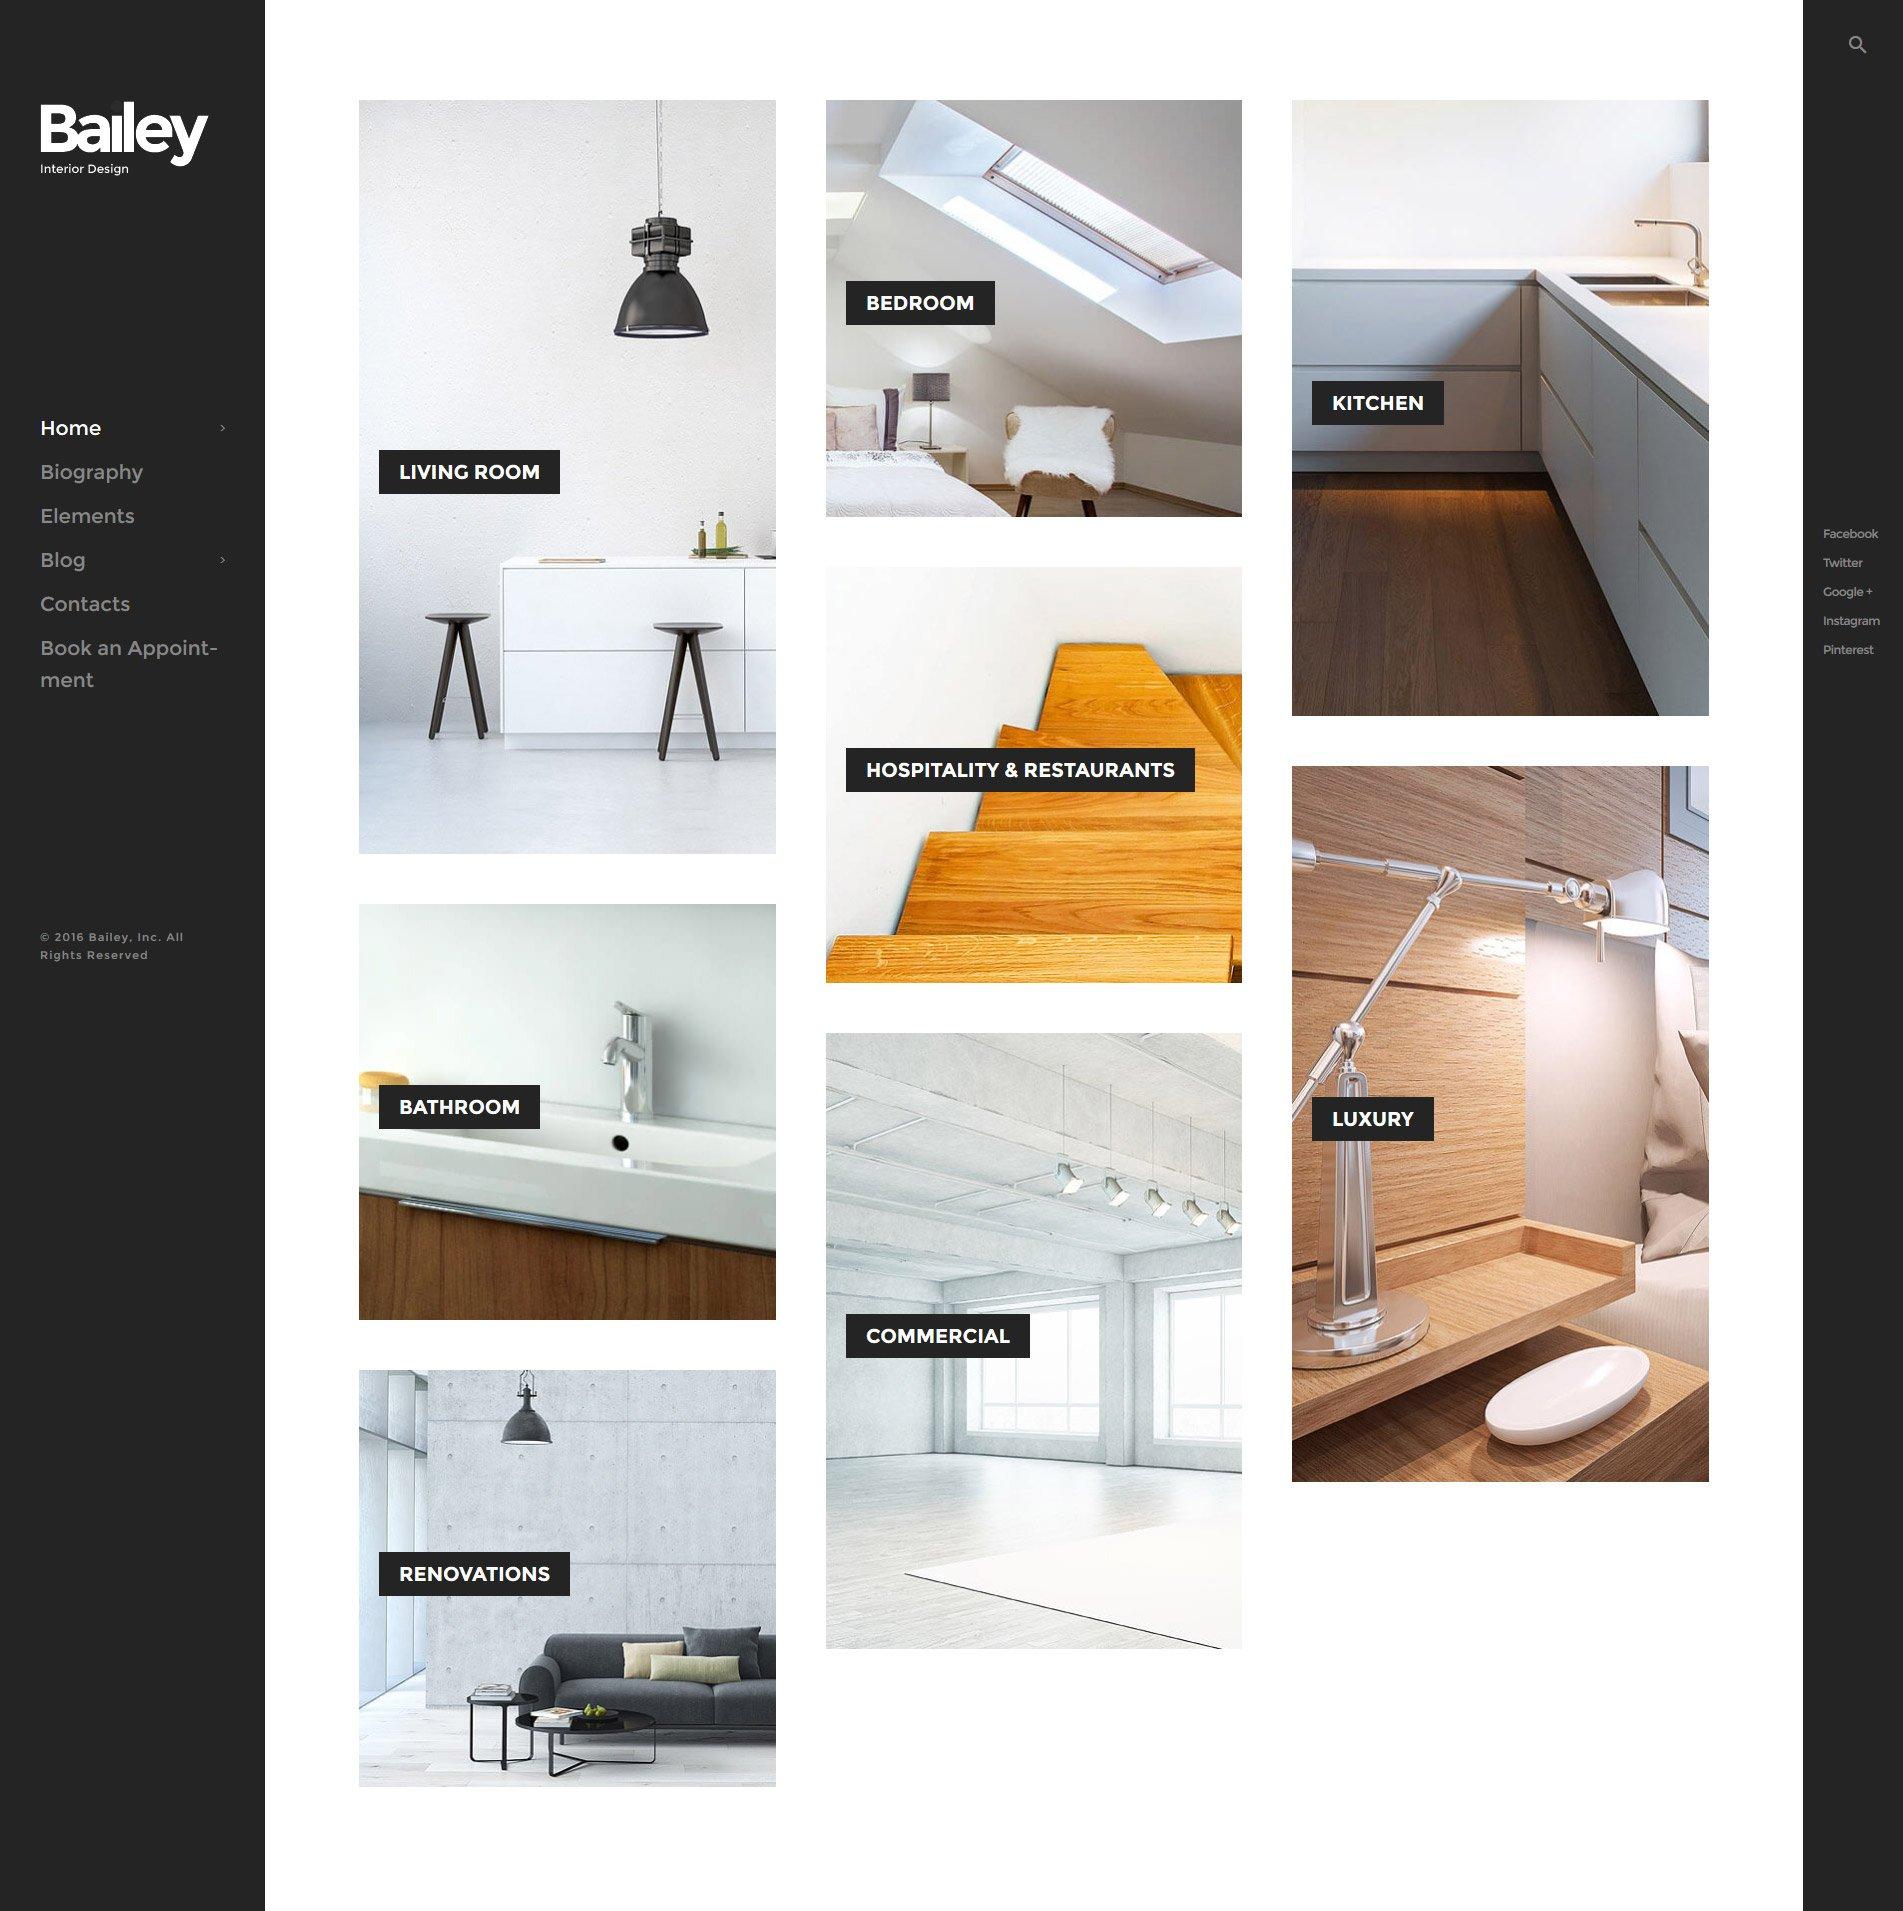 Шаблон дизайн интерьеров №59022 #59022